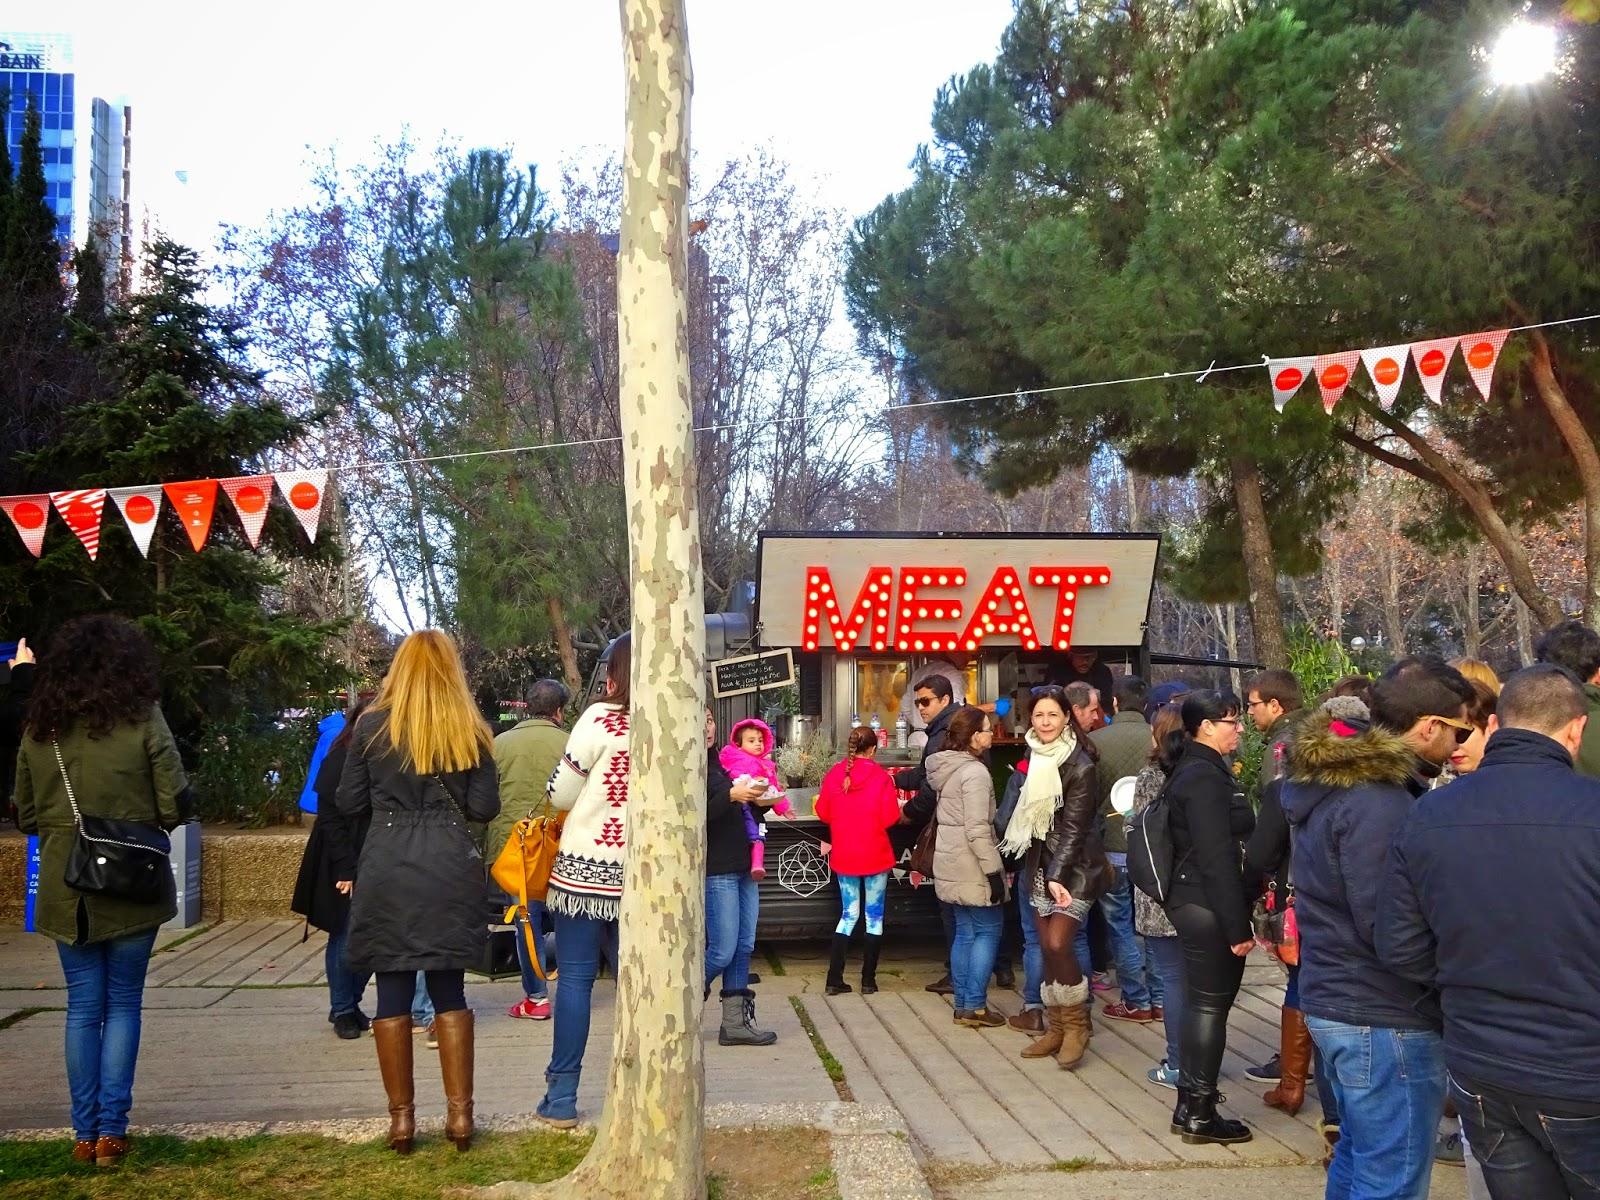 MadrEat Market Caravan Azca Foodtruck Madrid Gastronomía Gourmet